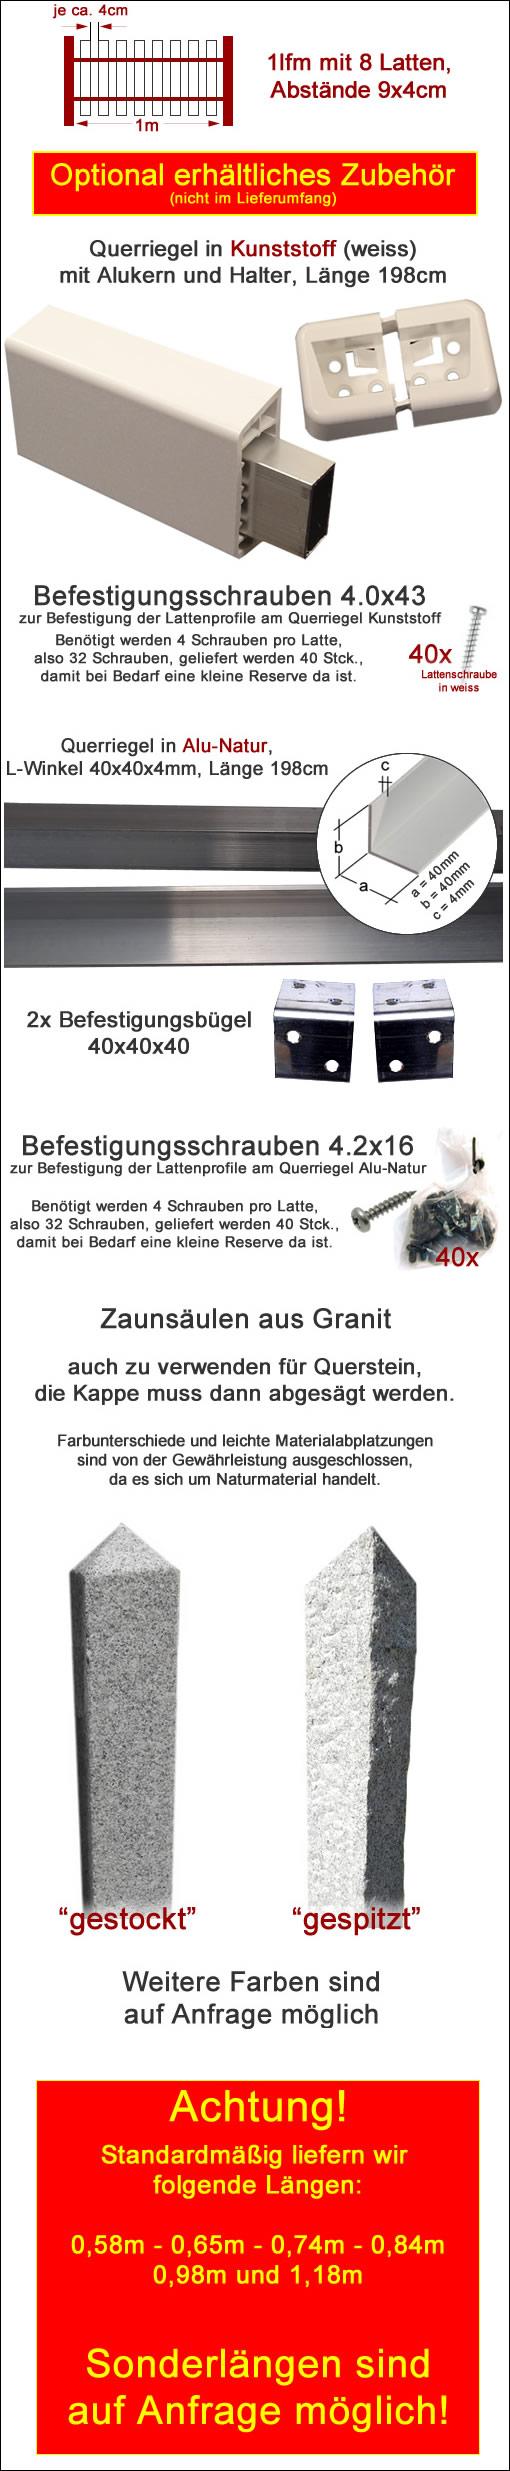 lfm Kunststoffzaun Gartenzaun Zaun Zäune Zierzaun Kunststoff